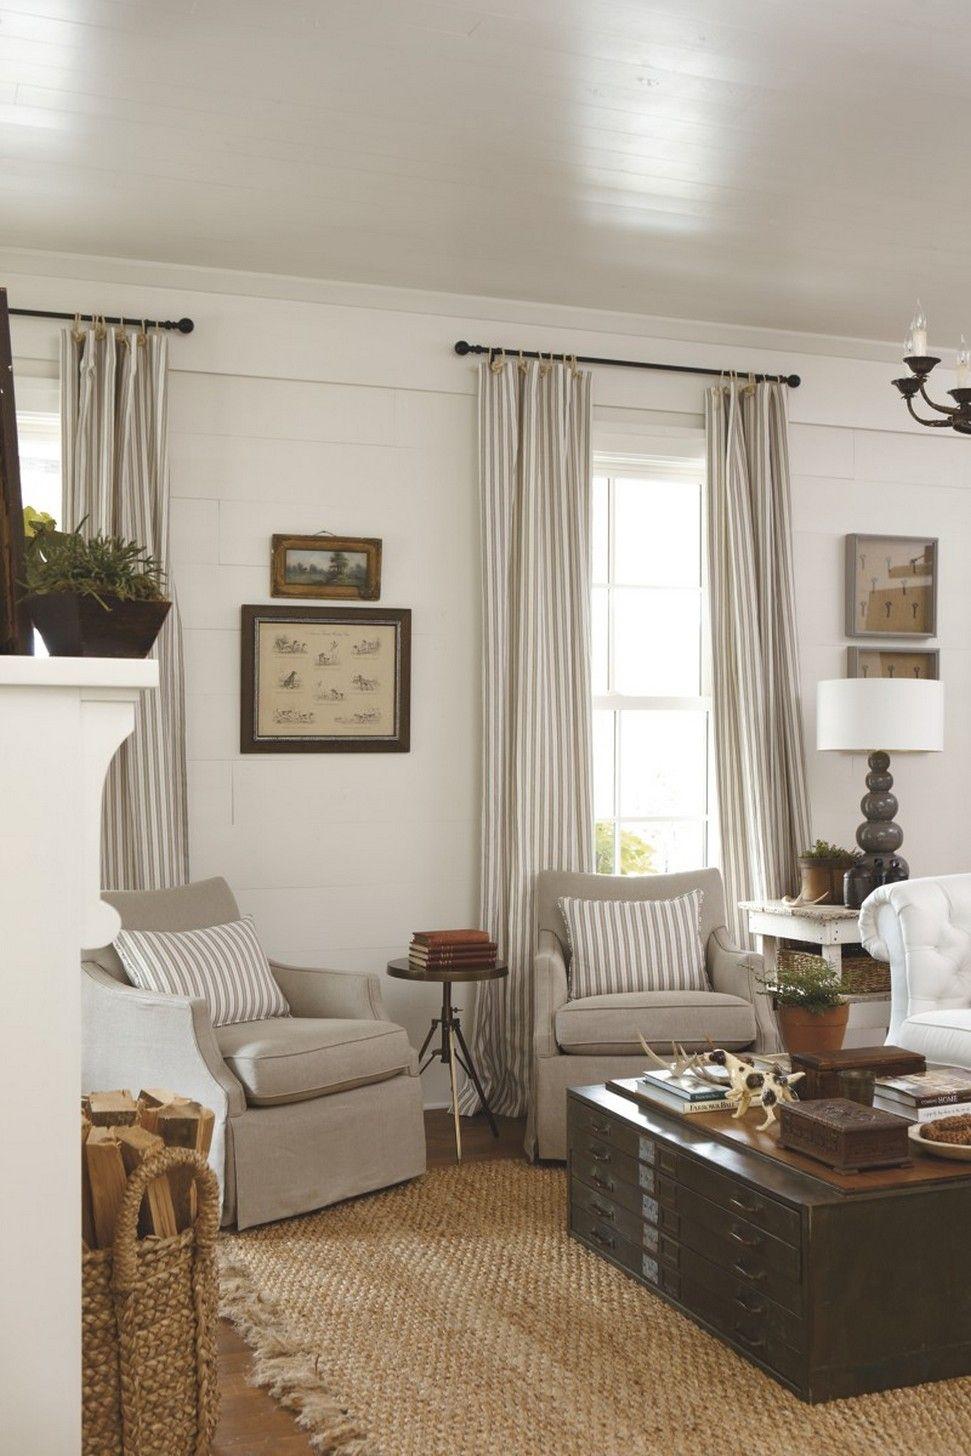 9 Best Modern Farmhouse Living Room Curtains Decor Ideas 3 In 2020 Farm House Living Room Curtains Living Room Modern Farmhouse Living Room